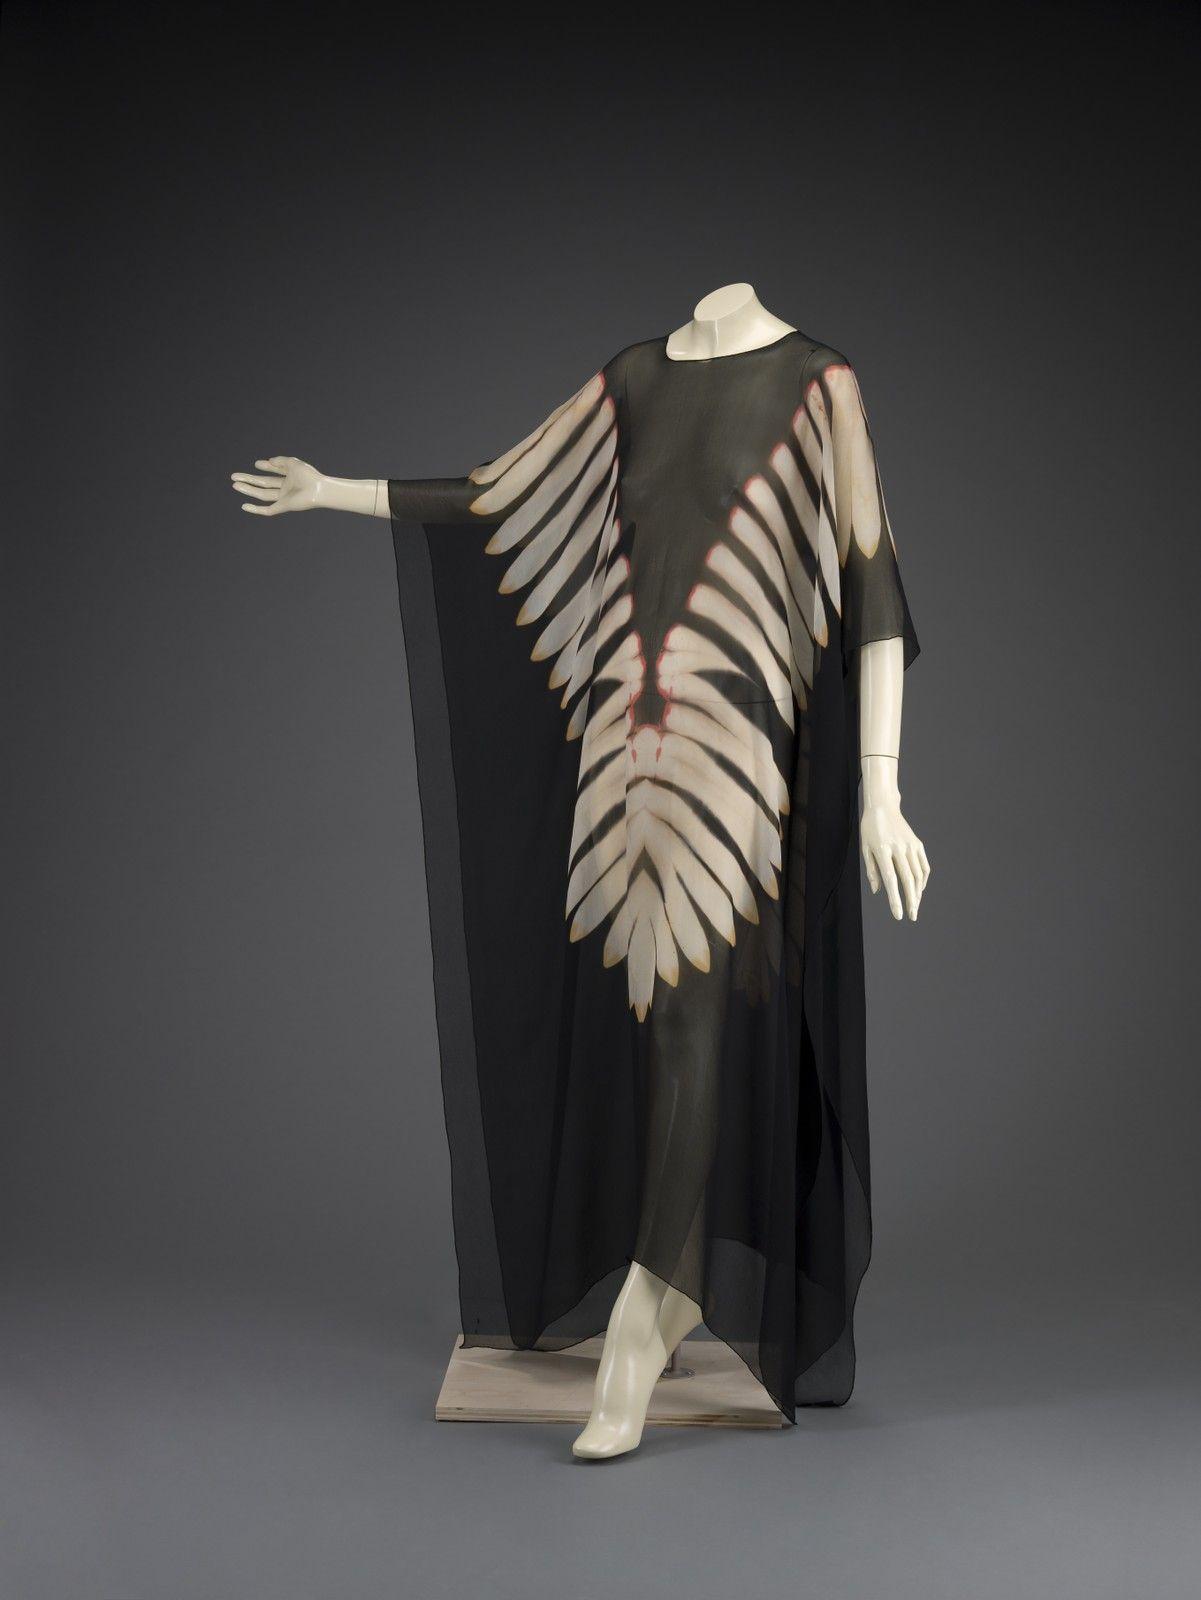 1971, America - Evening dress by Halston - Silk chiffon, tie-dyed